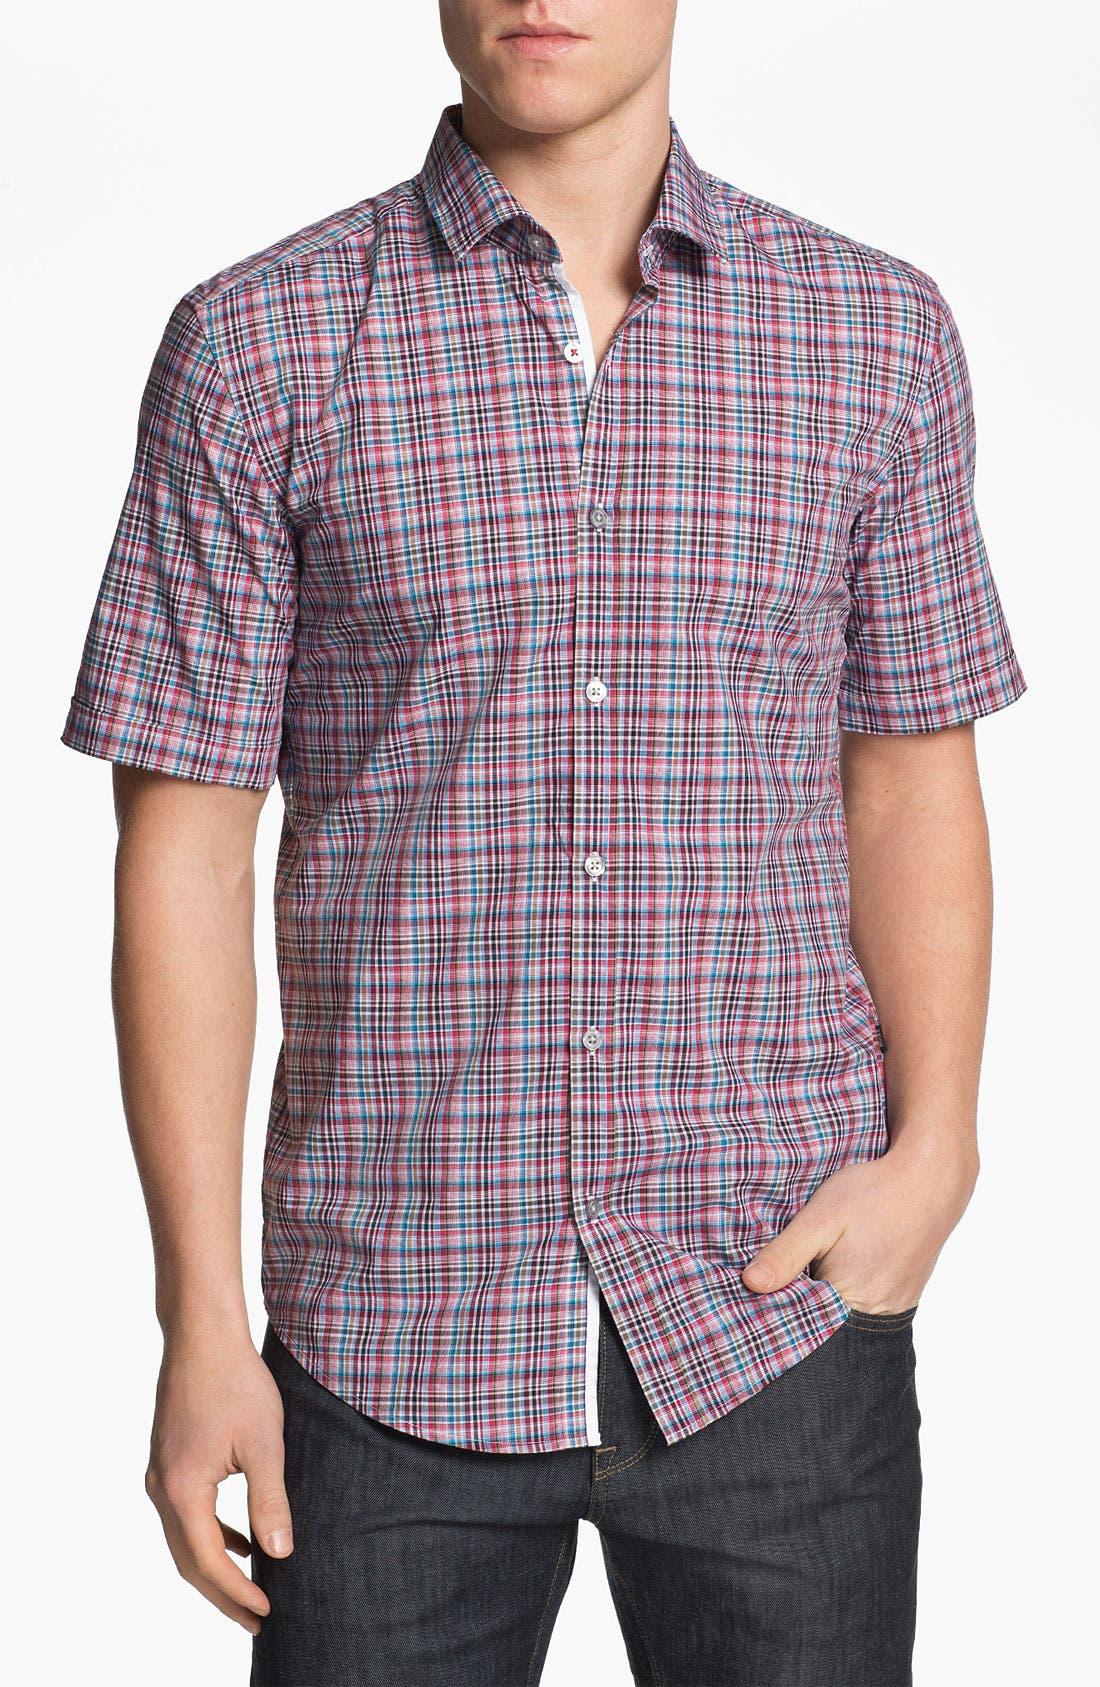 Main Image - BOSS HUGO BOSS 'Ring 2' Slim Fit Short Sleeve Sport Shirt